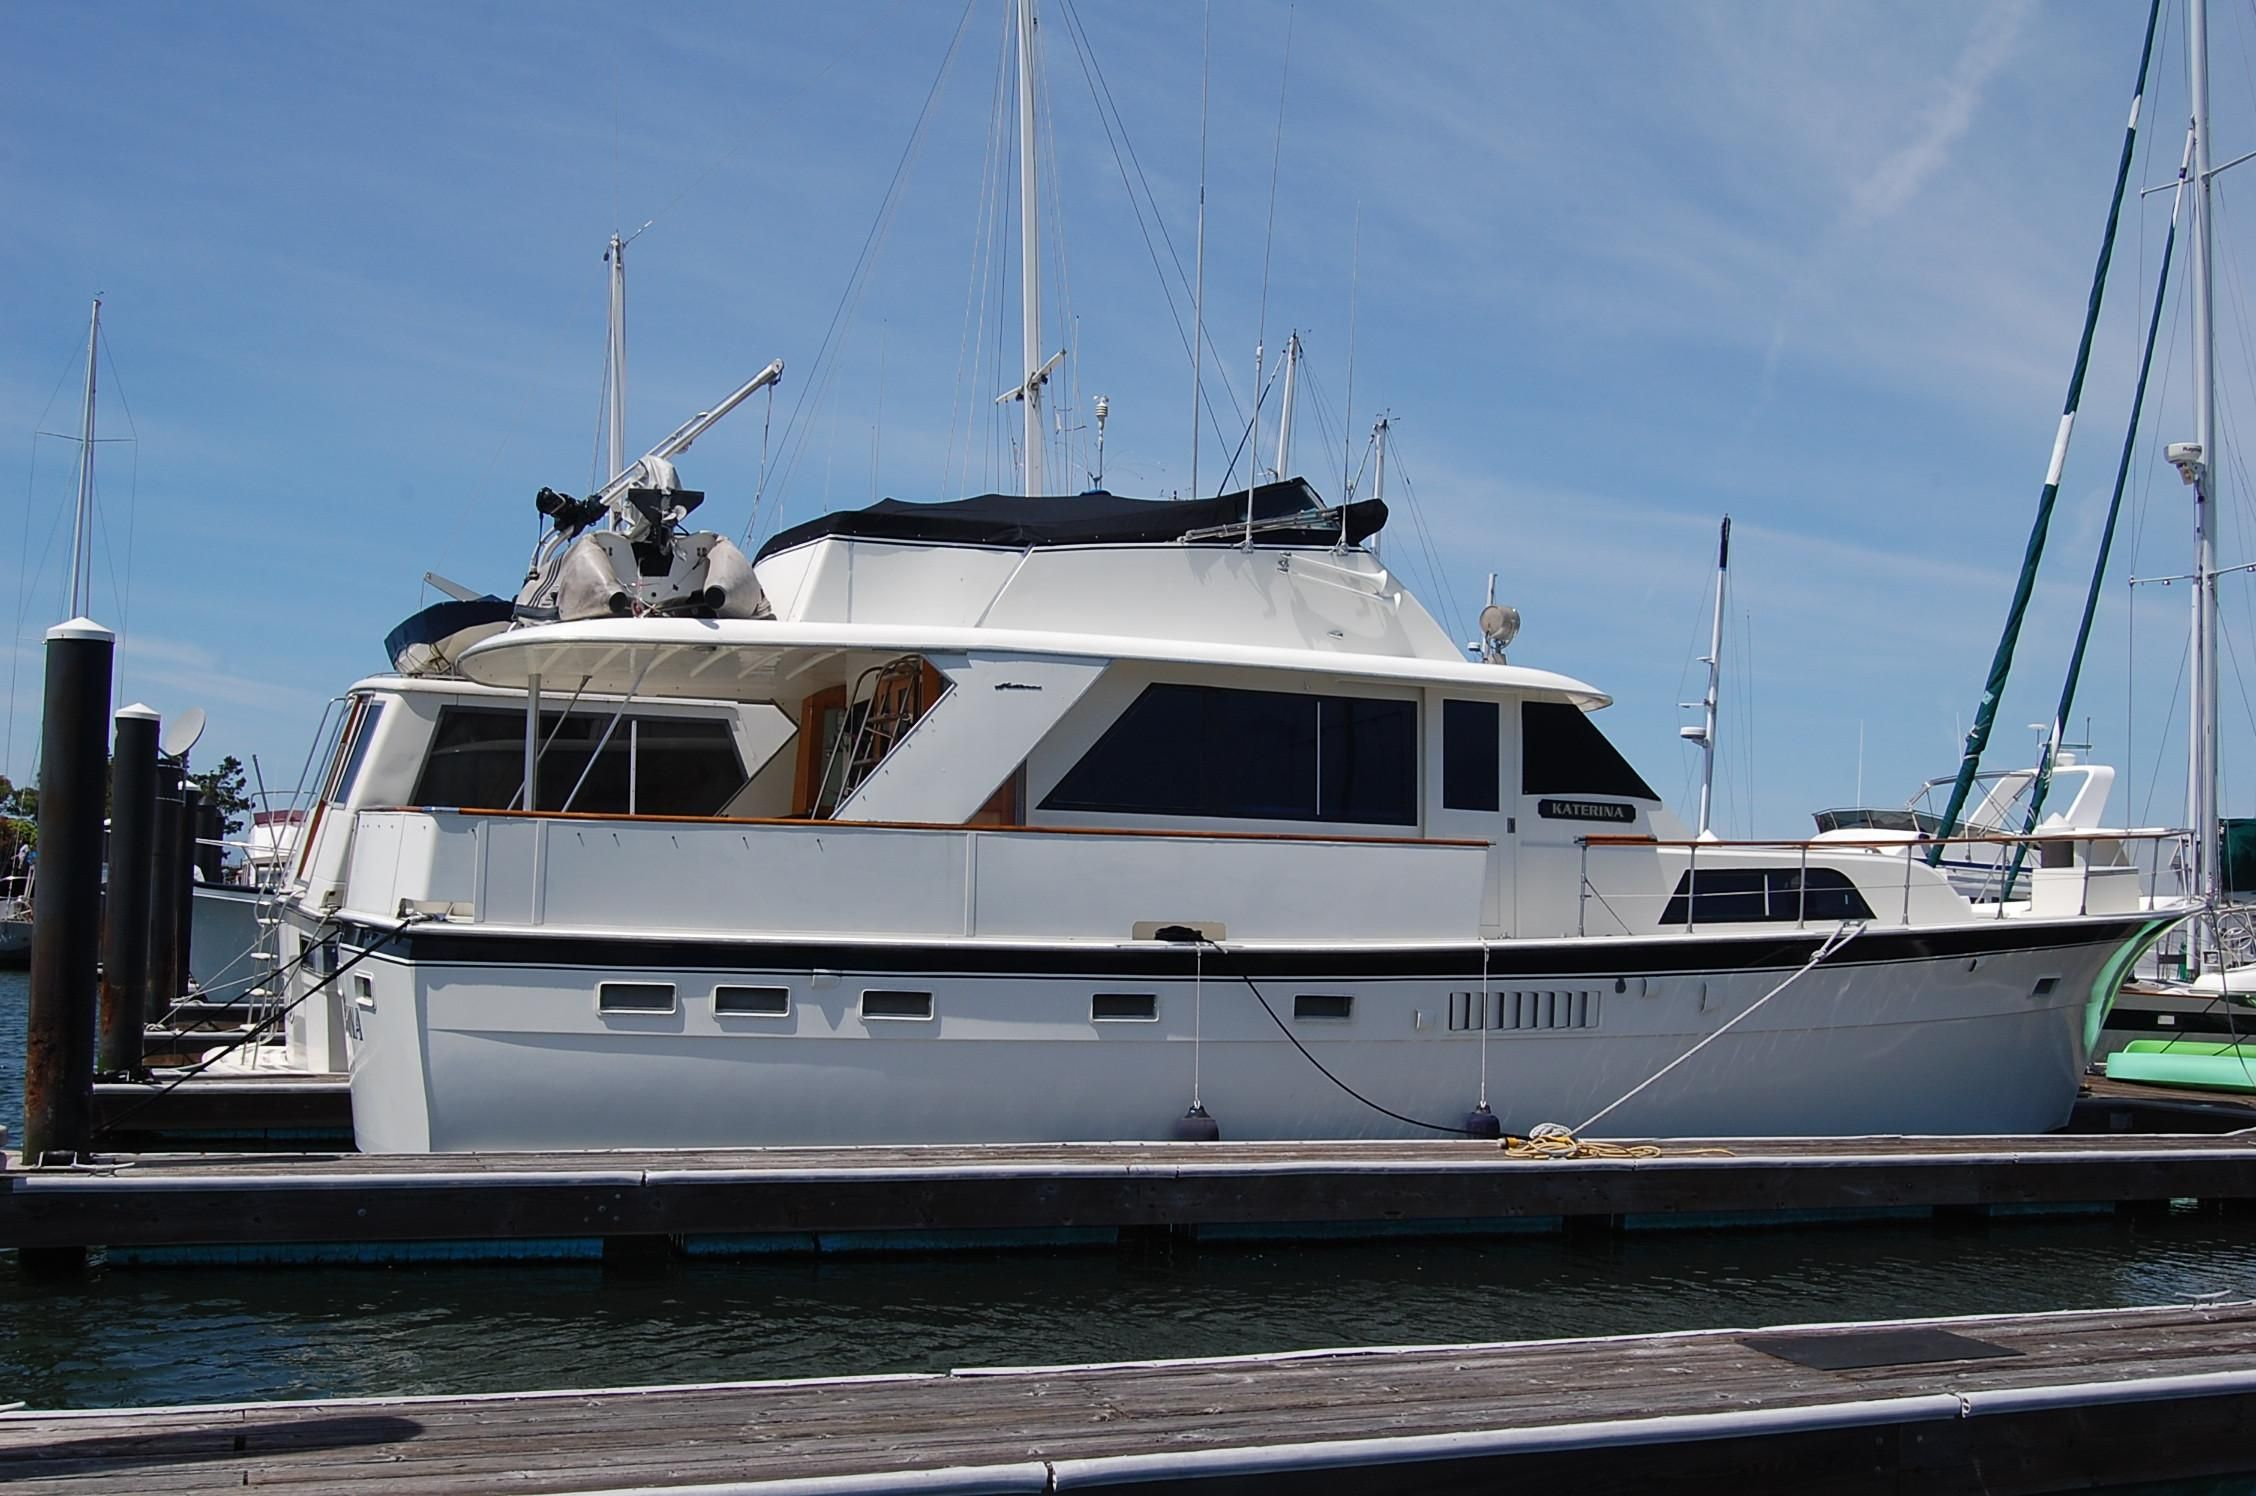 Versilcraft Phantom - Used Motor Boats for Sale - Ancasta